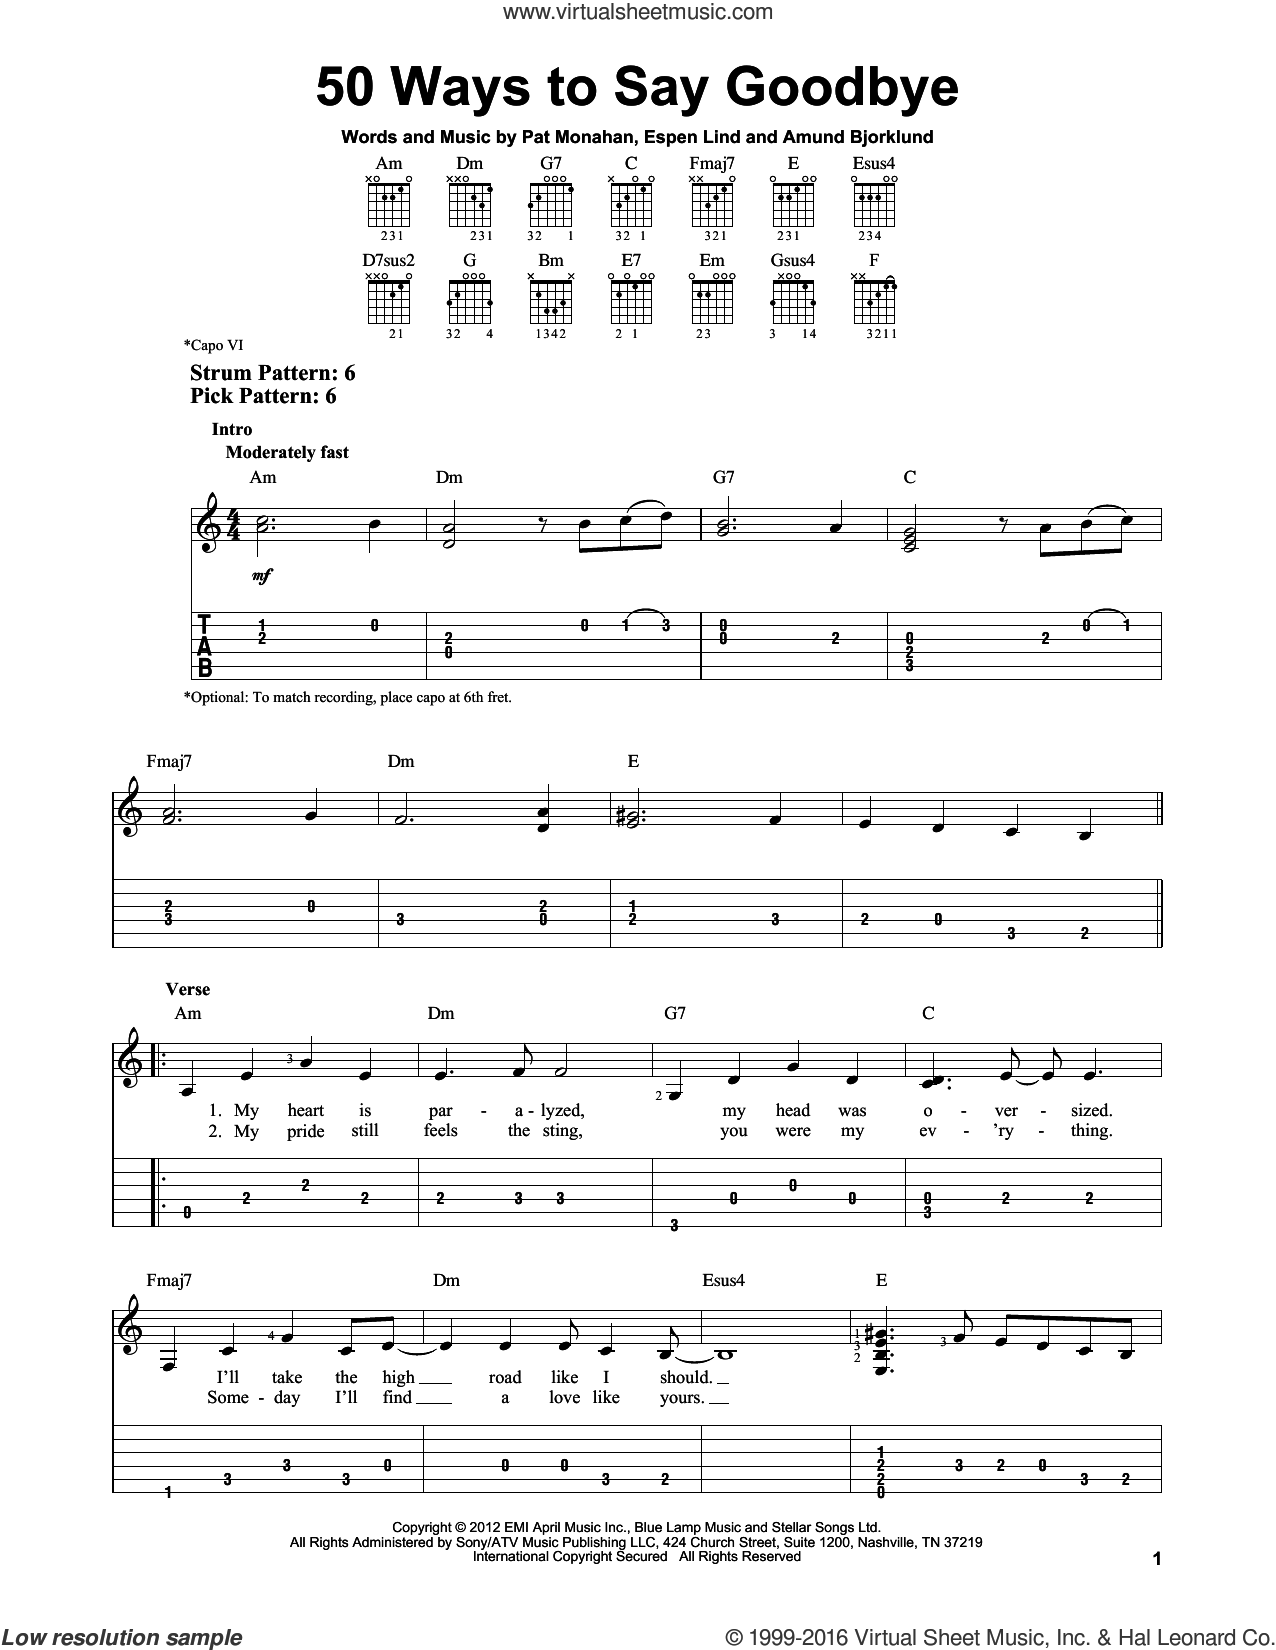 50 Ways To Say Goodbye sheet music for guitar solo (easy tablature) by Train, Amund Bjorklund, Espen Lind and Pat Monahan, easy guitar (easy tablature)